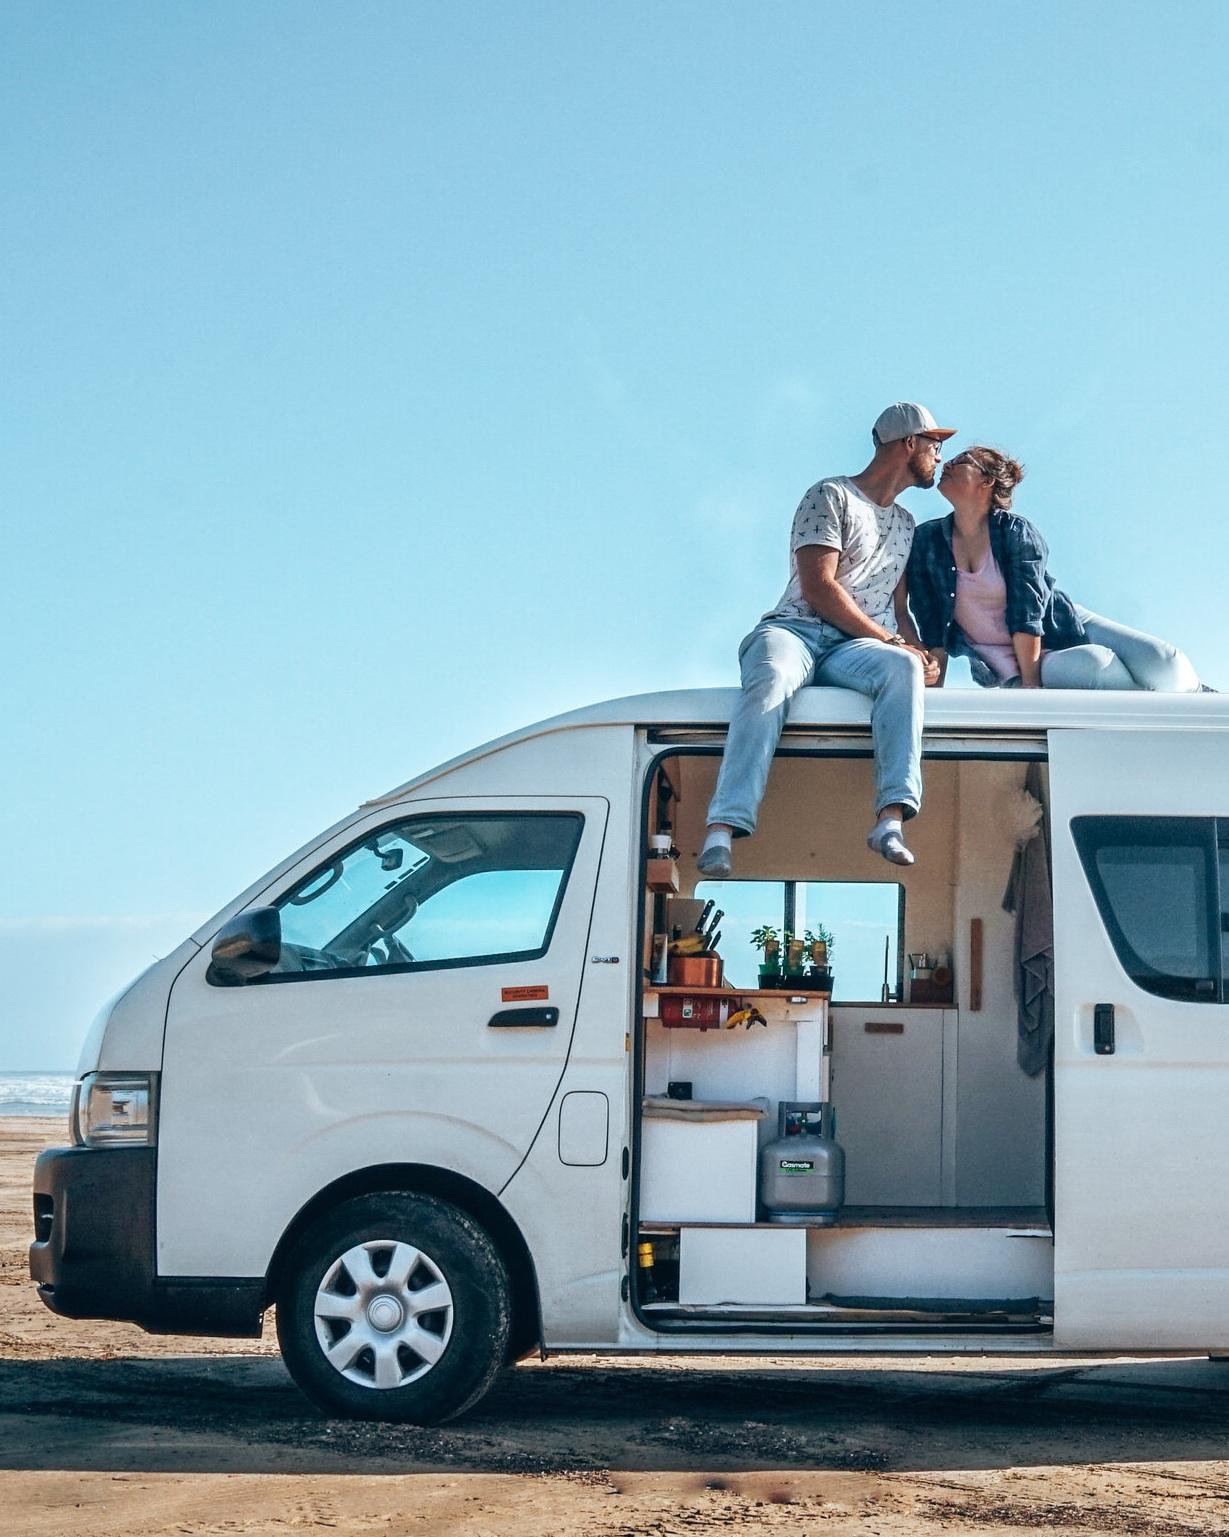 Craving Adventure - New Zealand - Travel - Adventure - Couple - Van life - Beach - Blog